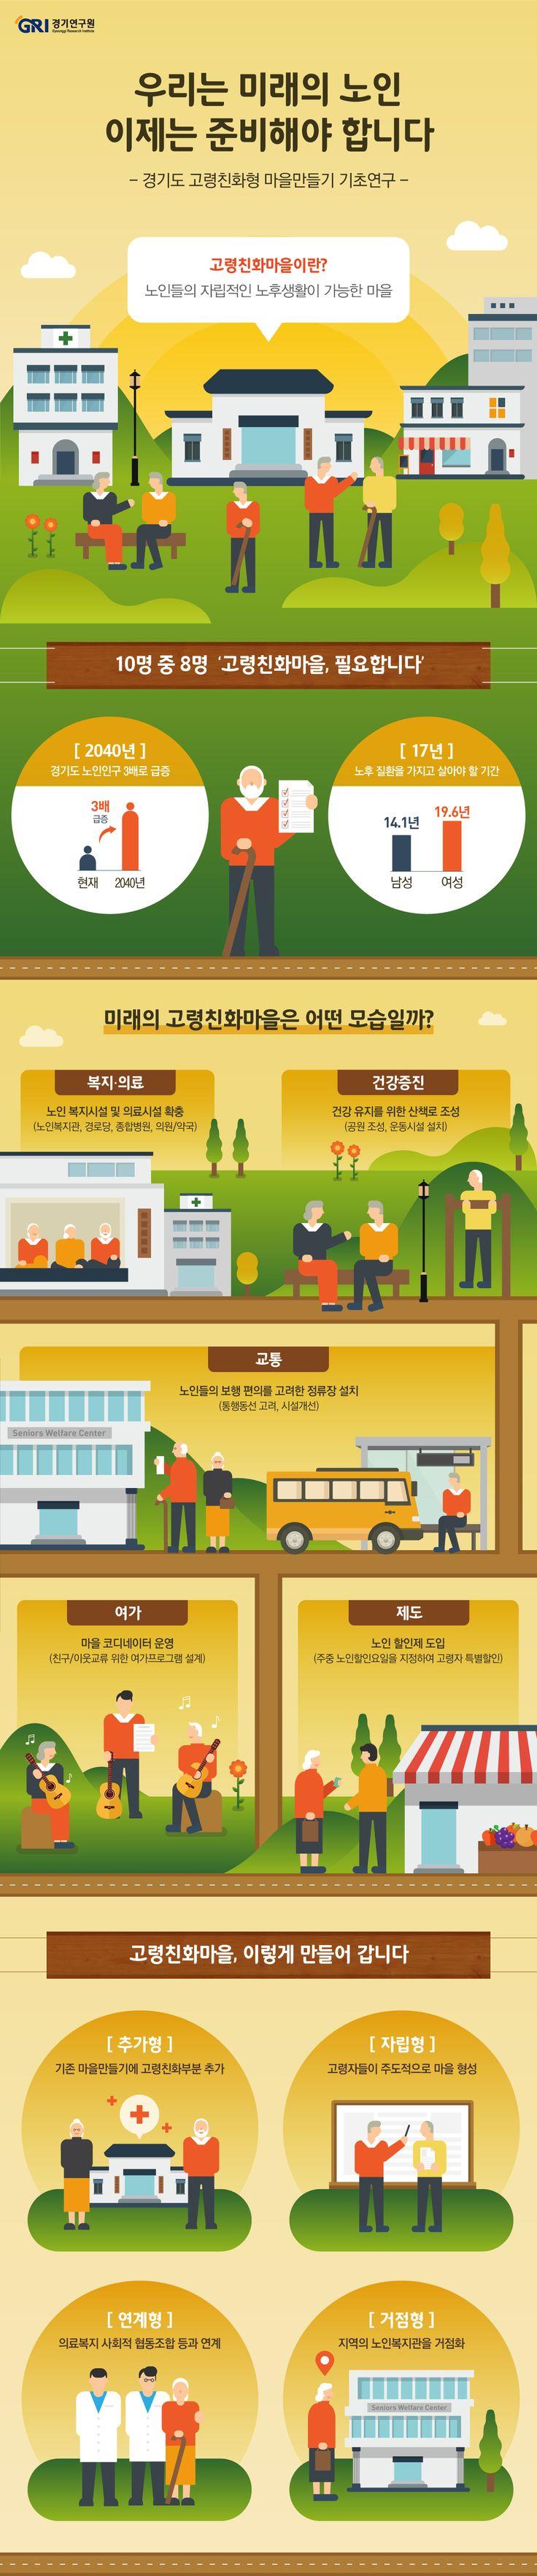 [infographic] '우리는 미래의 노인, 이제는 준비해야 합니다' 고령친화마을에 대한 인포그래픽